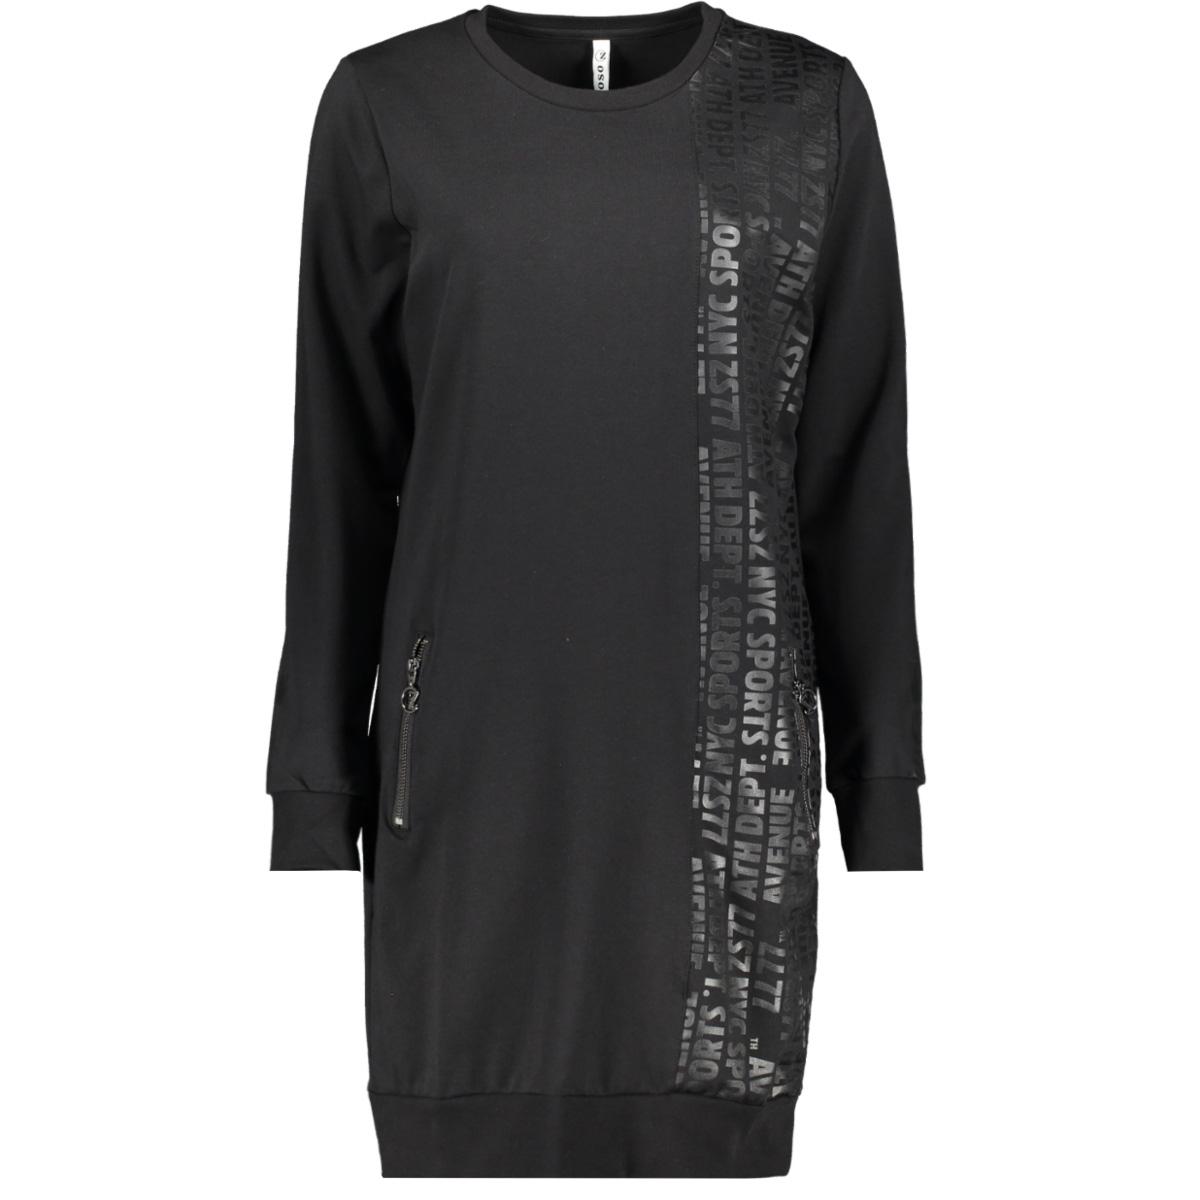 nina sweat dress with print 195 zoso jurk black